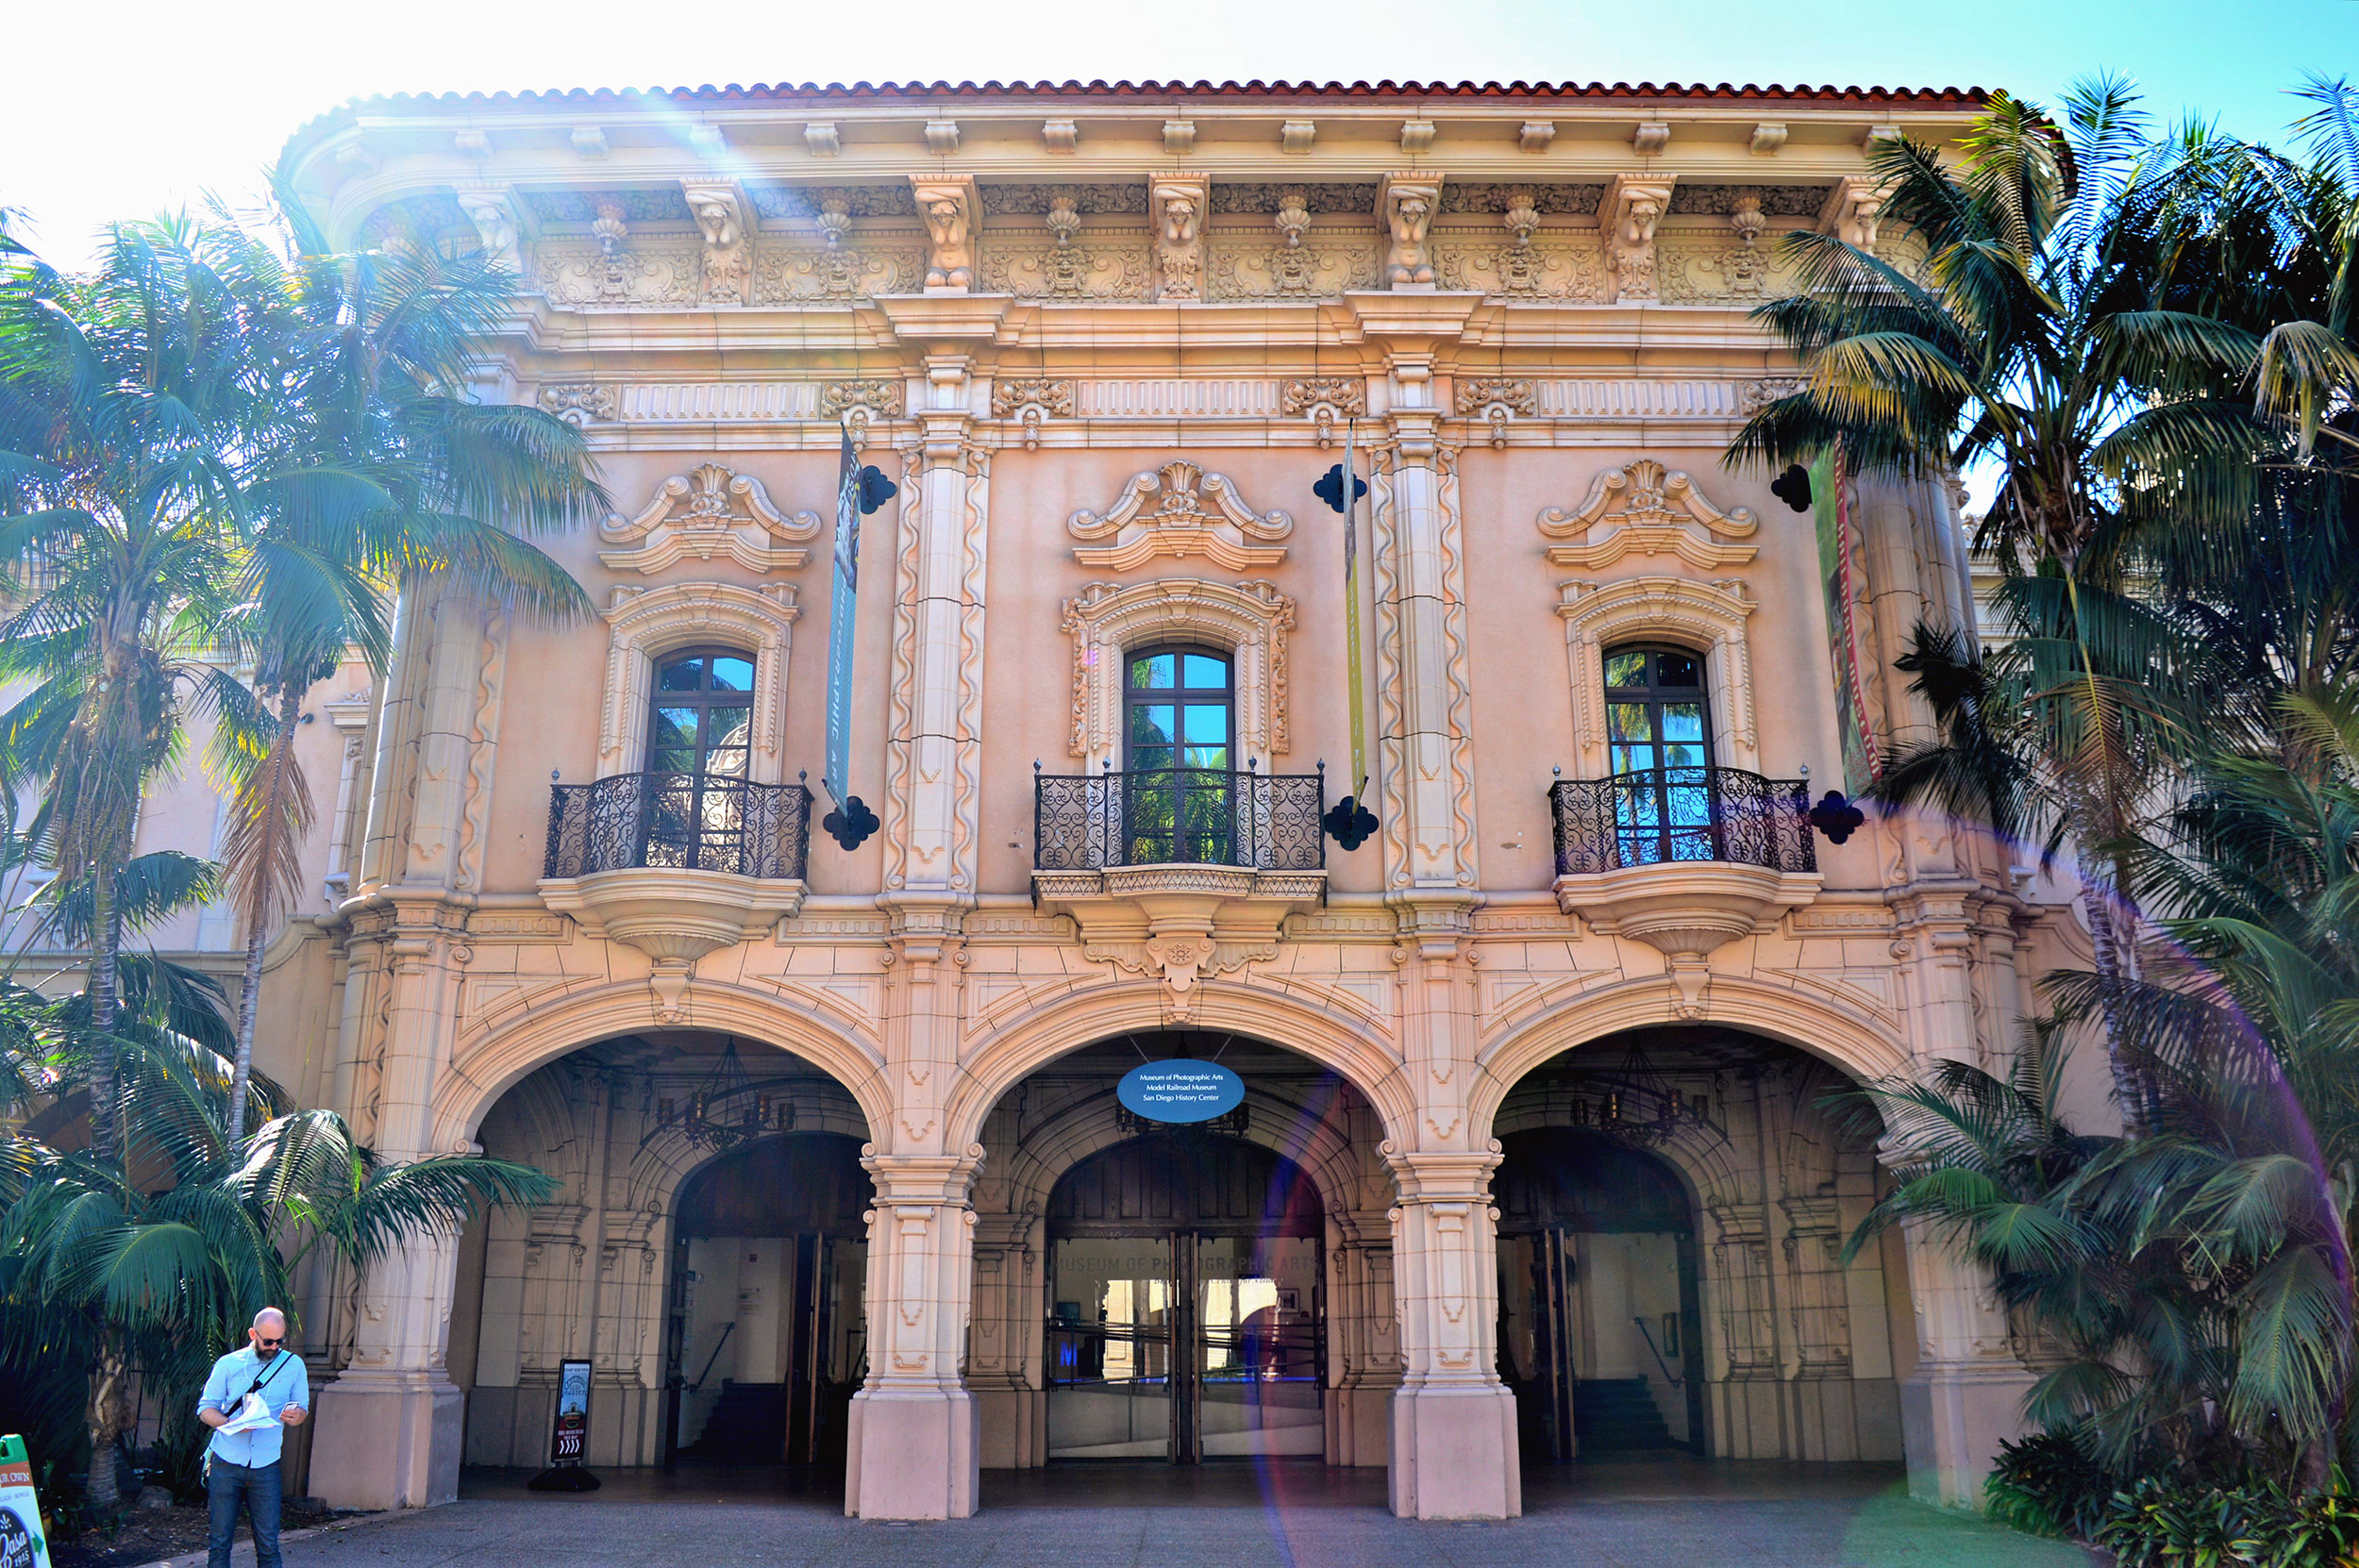 Museum of Photographic Arts (MOPA)